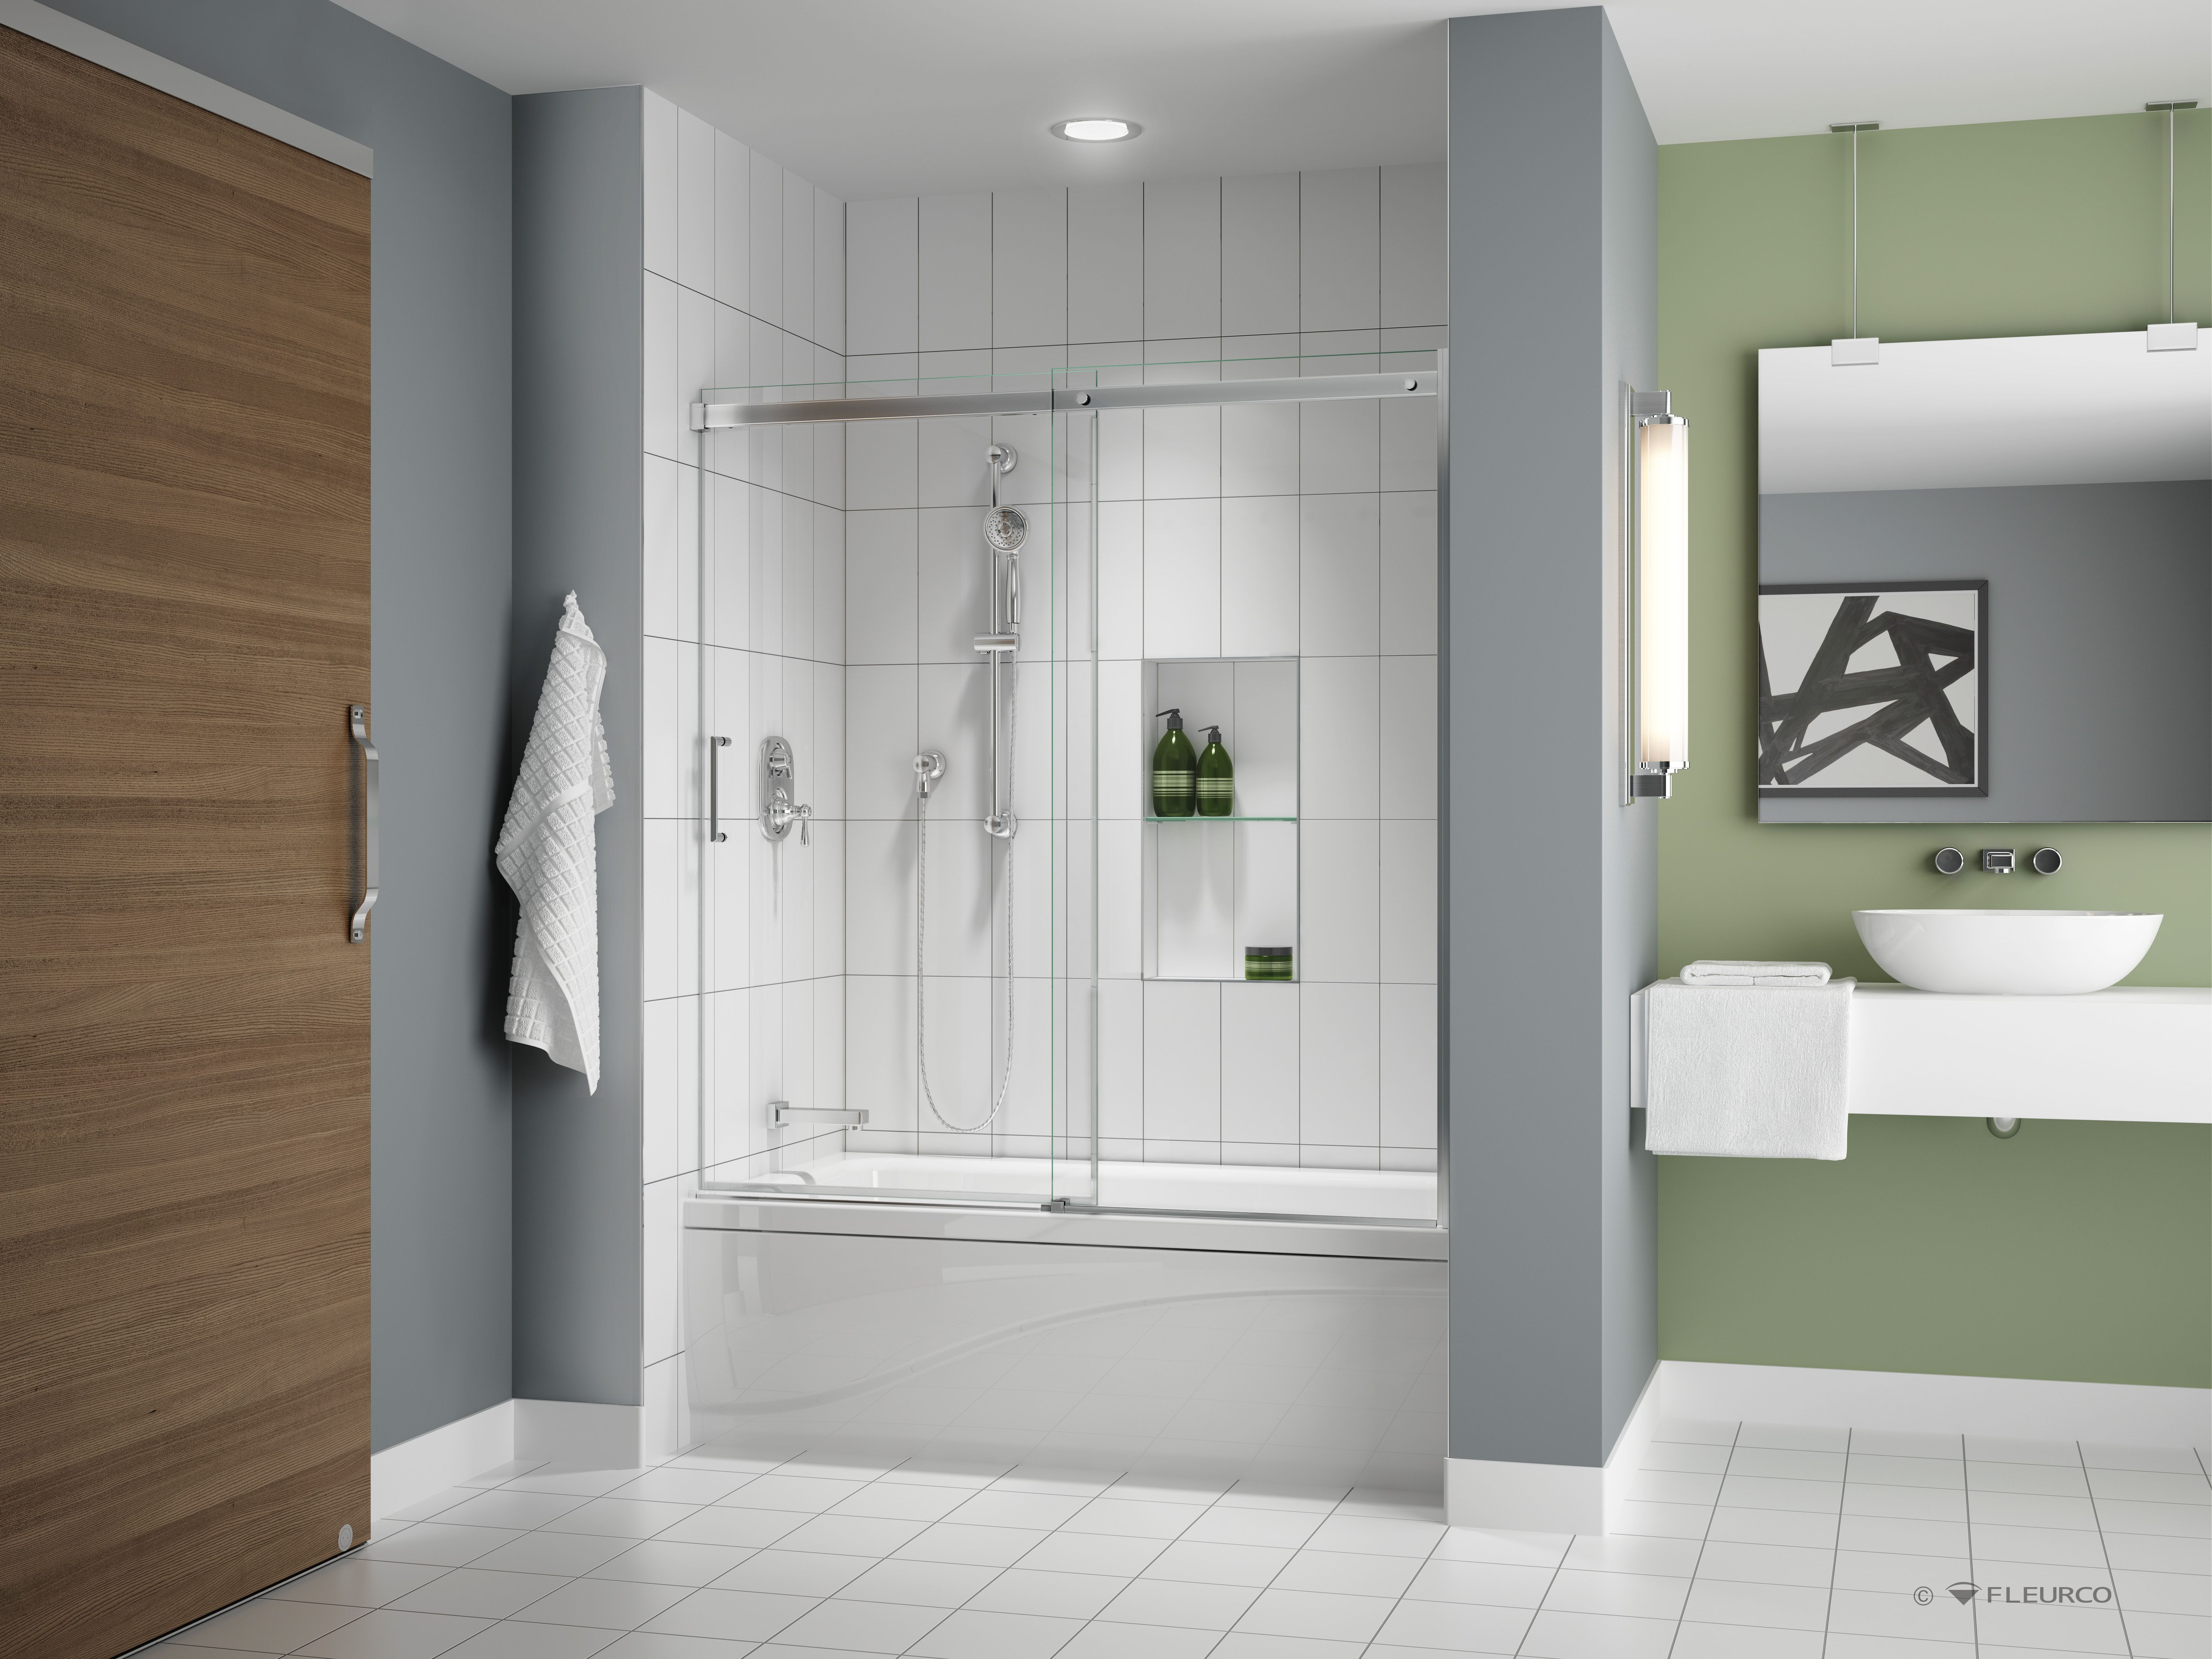 APOLLO Tub Shower Door By FLEURCO